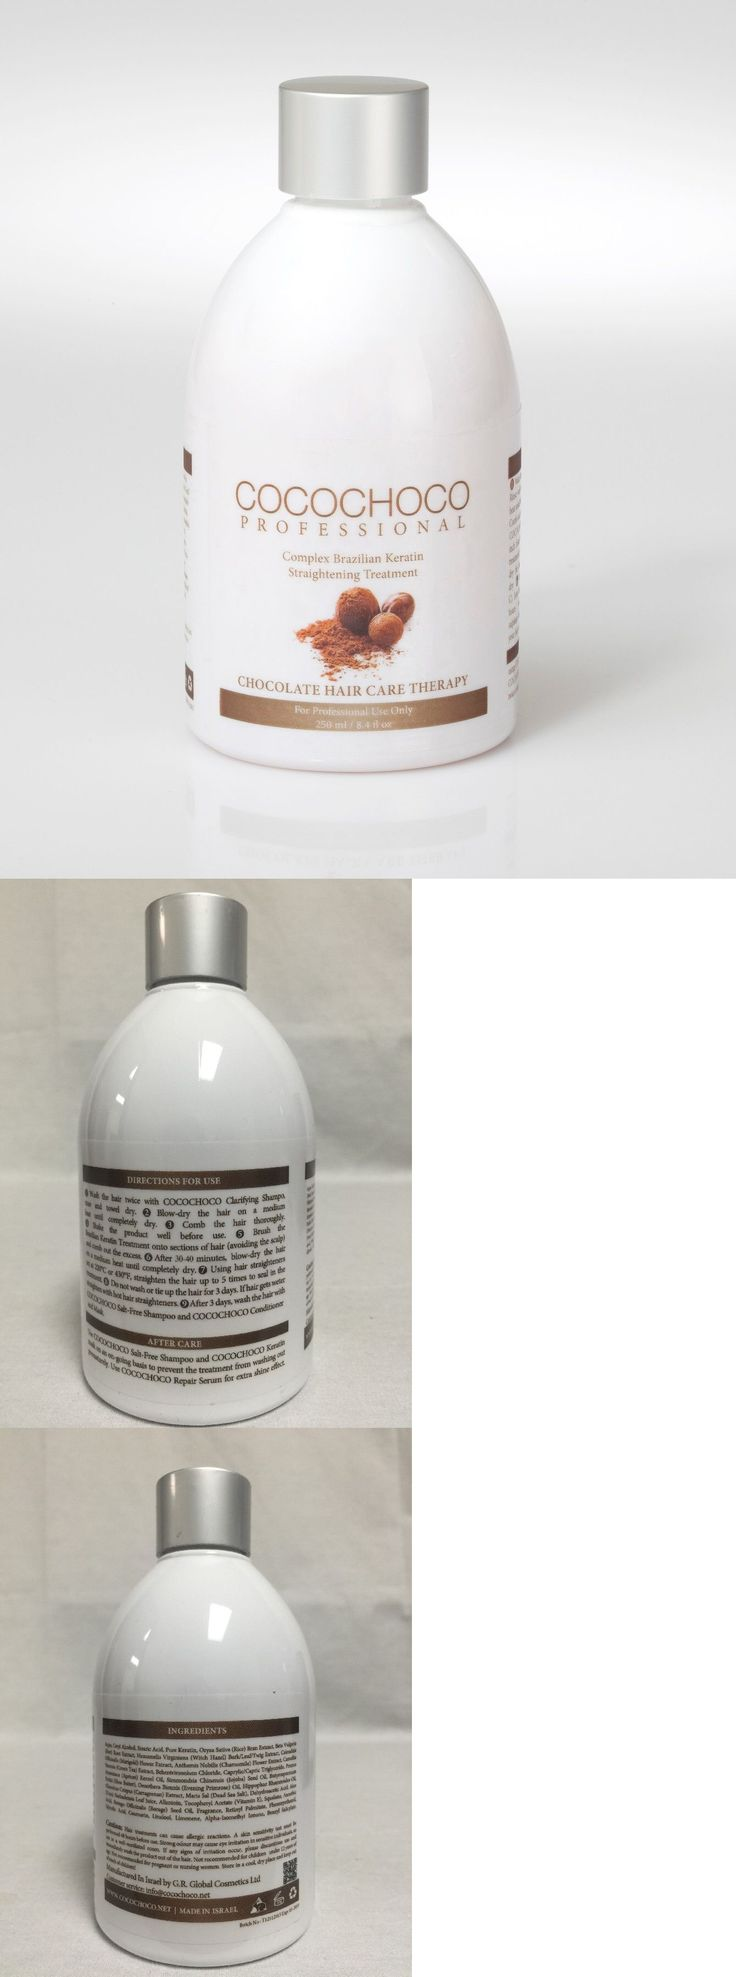 Hair Beauty: Cocochoco Original Brazilian Keratin Hair Treatment 8.4Oz 250Ml -> BUY IT NOW ONLY: $36.95 on eBay!